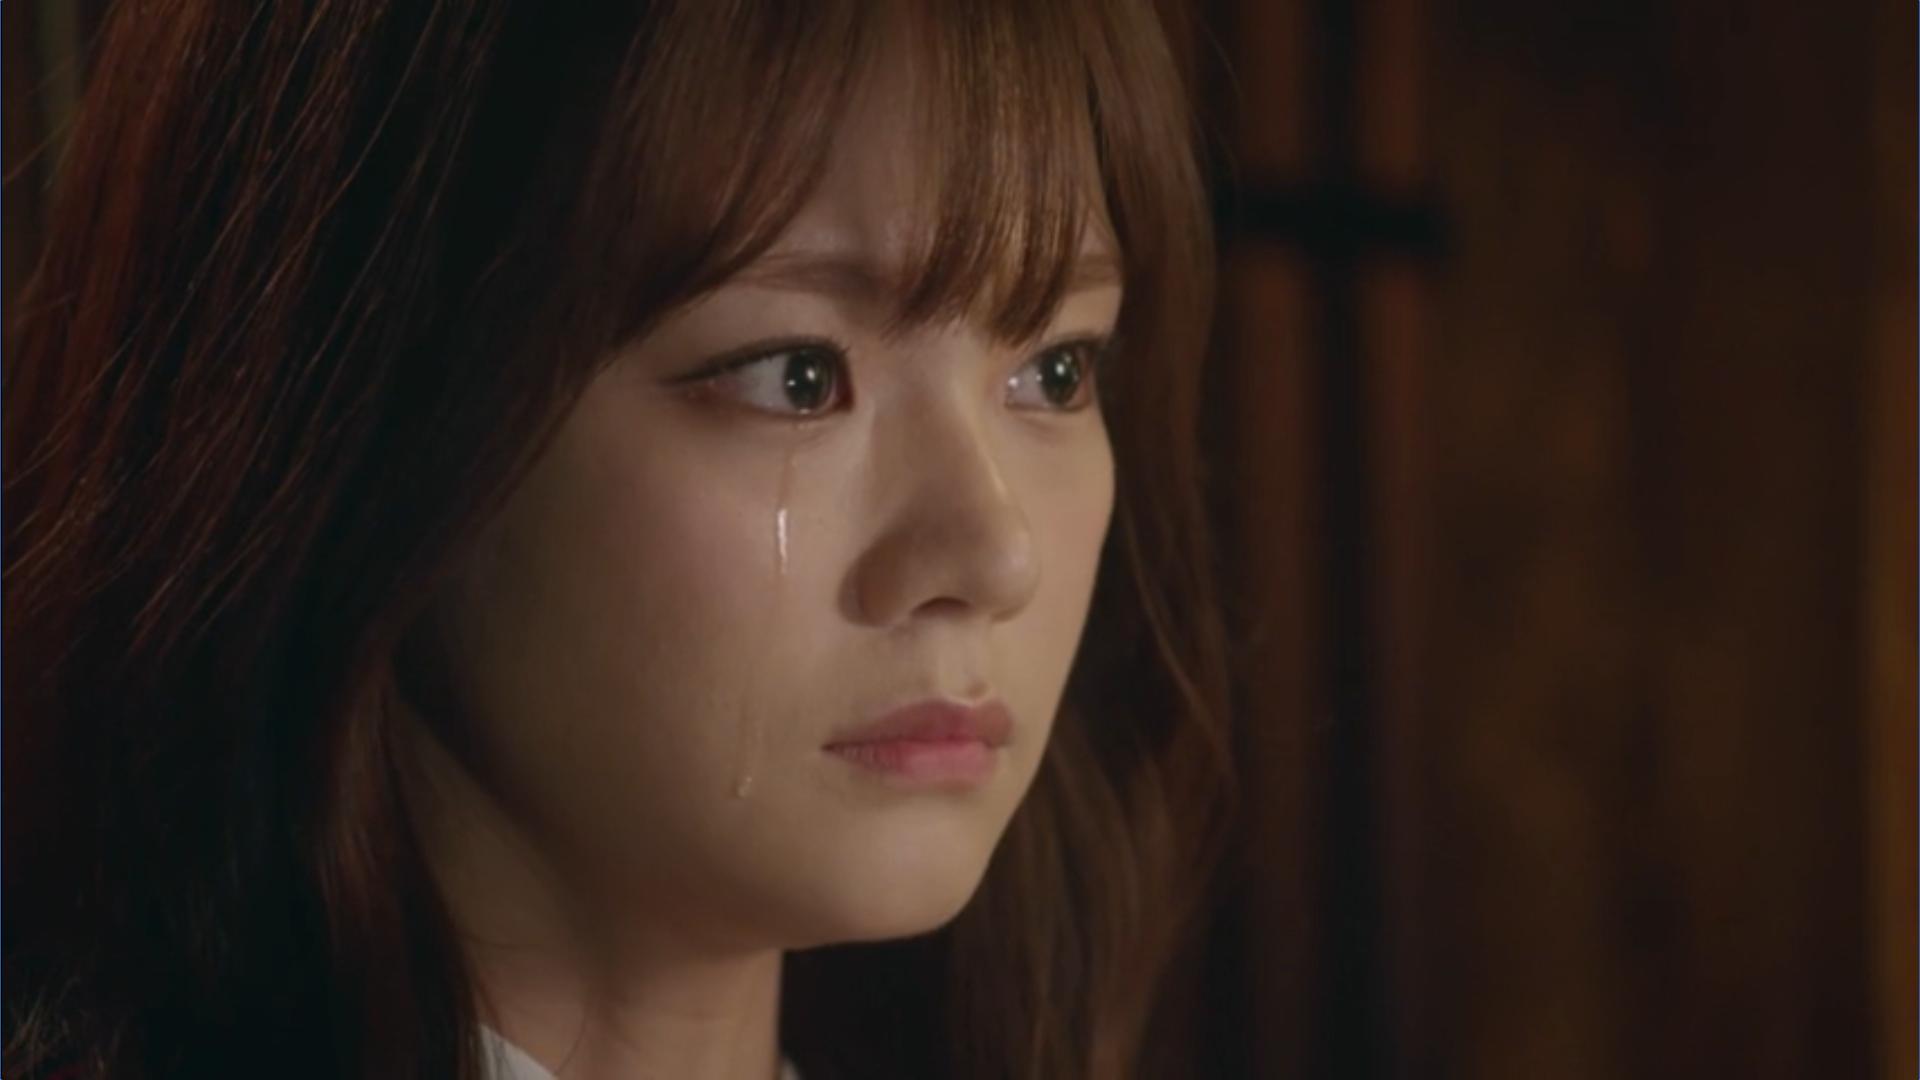 Wednesday 3:30 PM Kim Hye-won crying